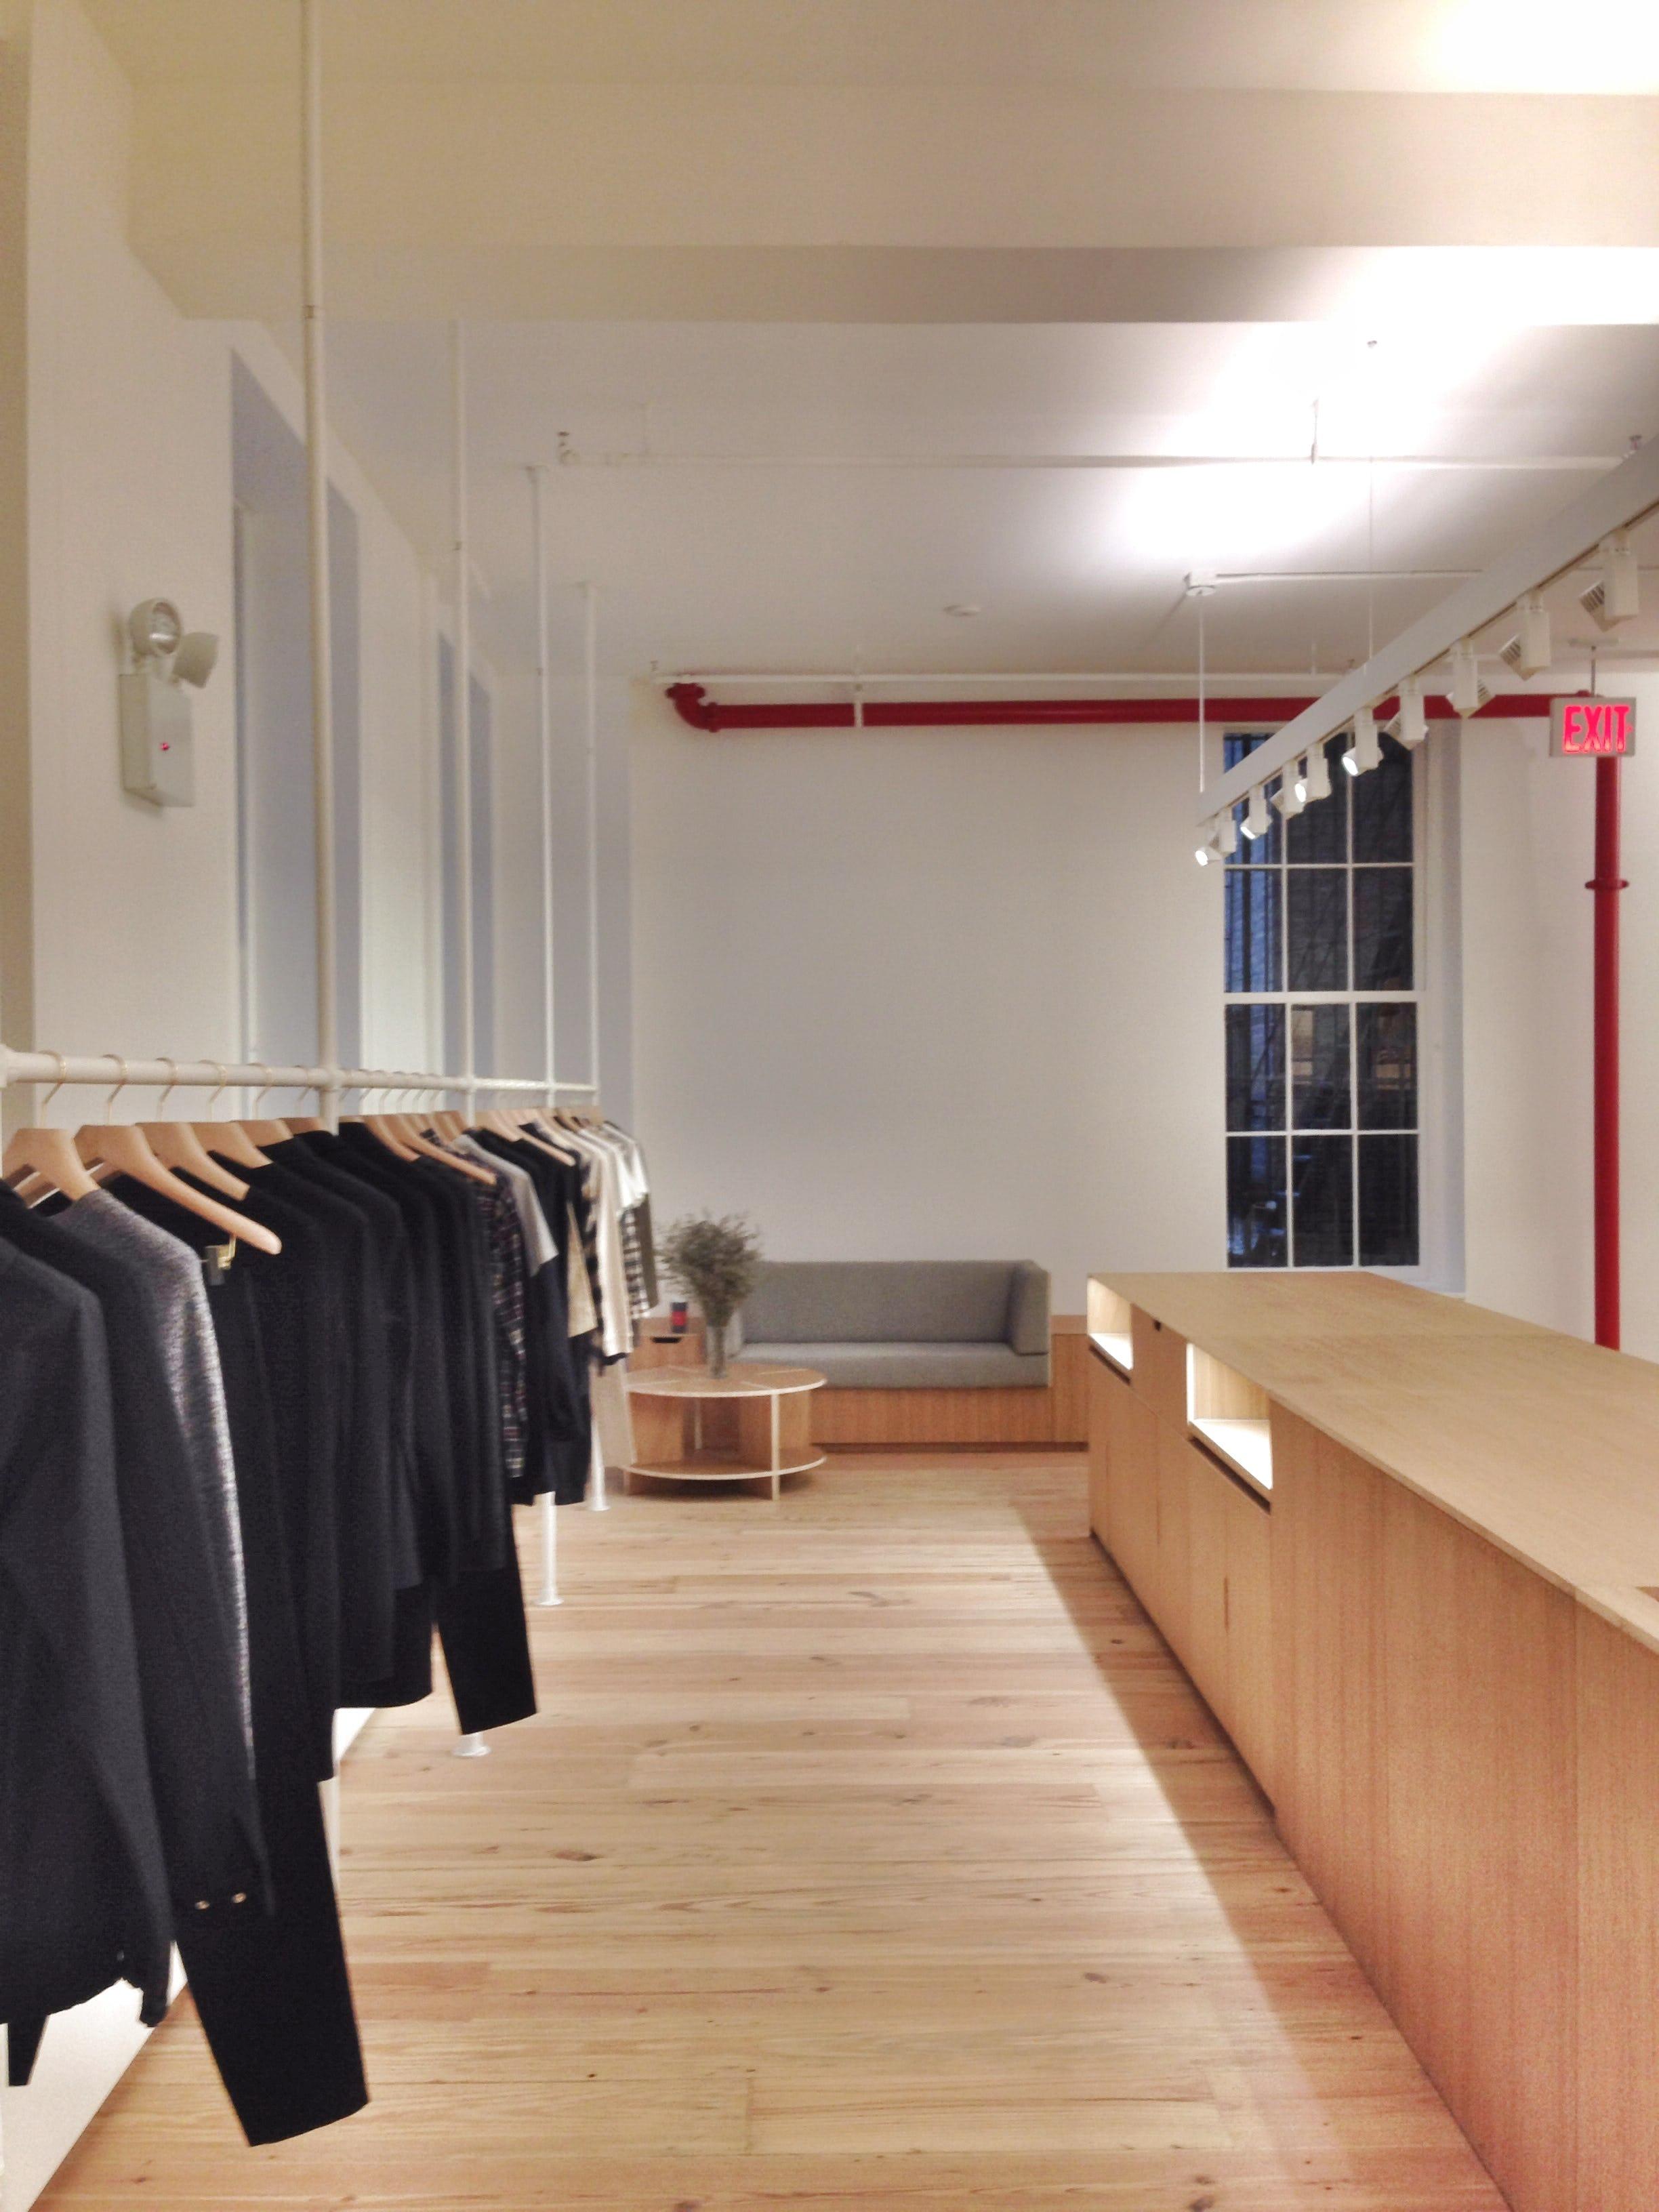 P apc showroom01